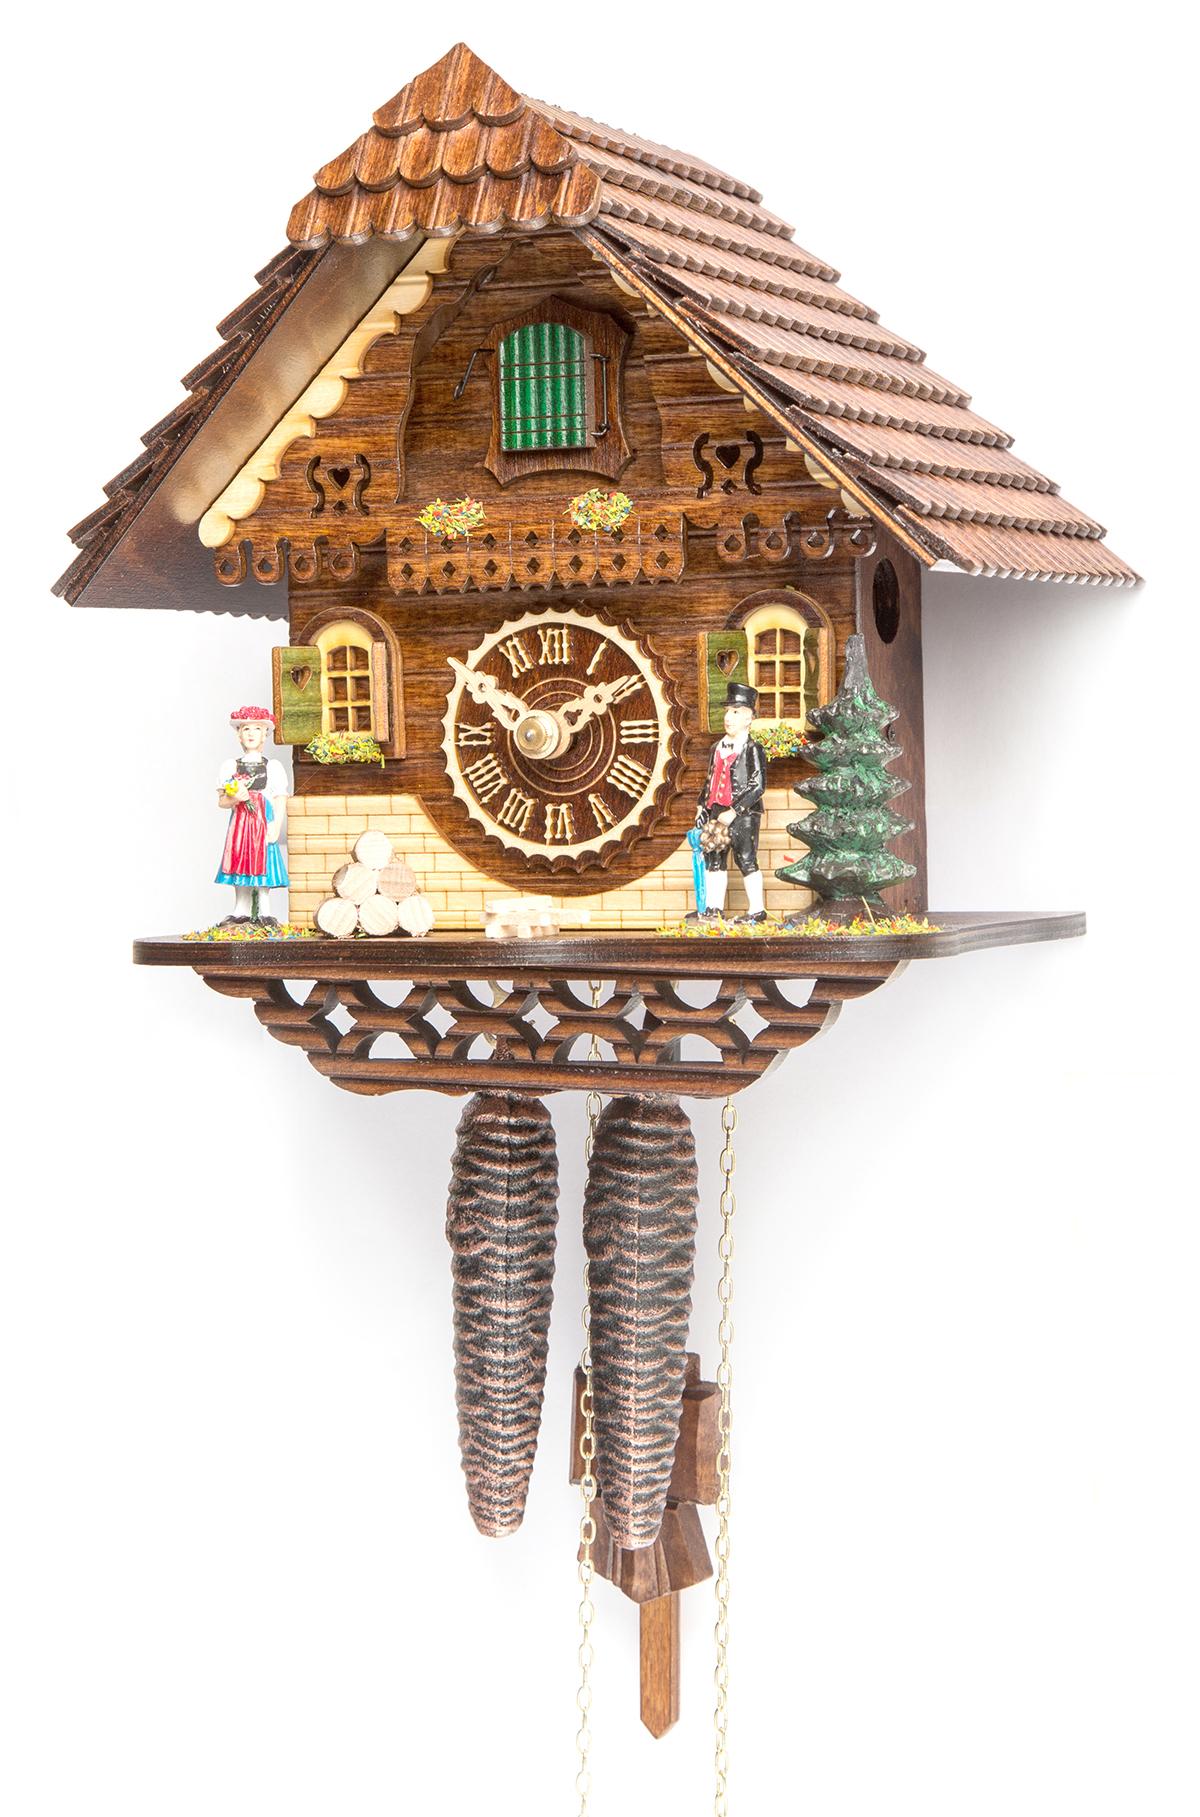 Часы настенные Часы настенные с кукушкой Tomas Stern 5022 chasy-nastennye-s-kukushkoy-tomas-stern-5022-germaniya.jpg